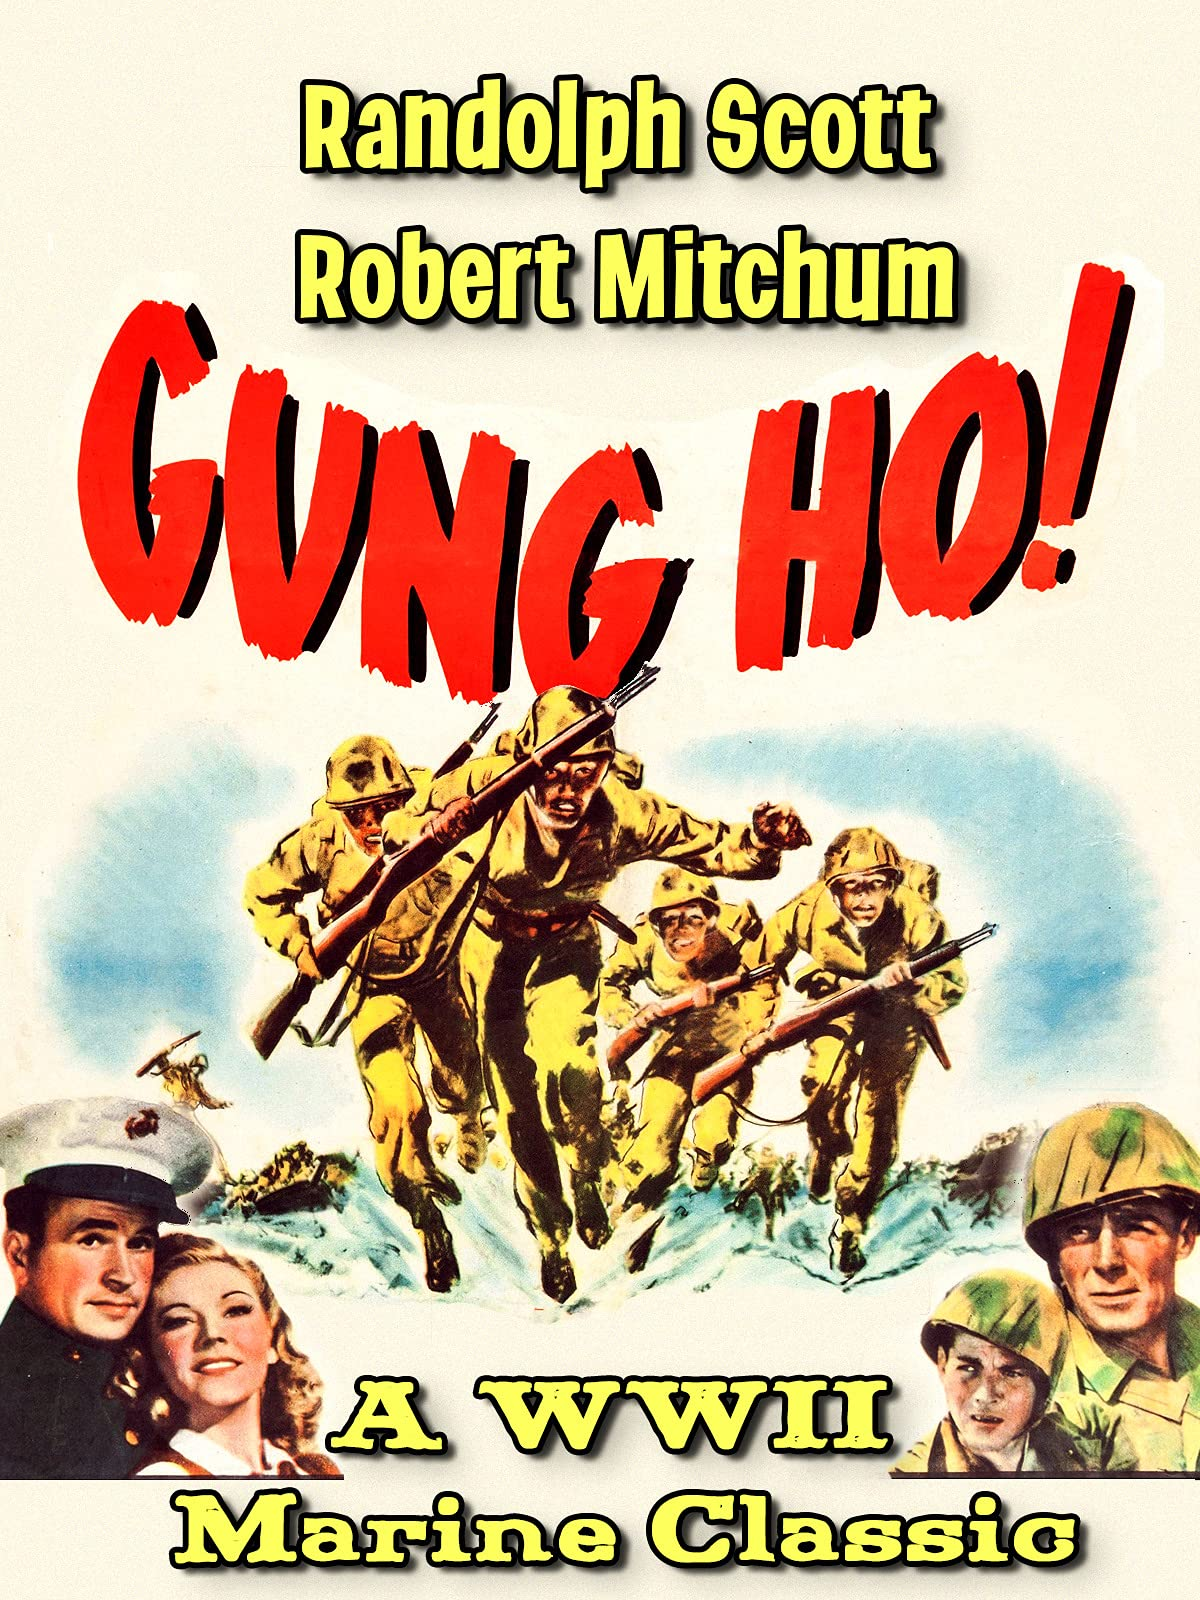 Randolph Scott & Robert Mitchum in Gung Ho! - A WWII Marine Classic